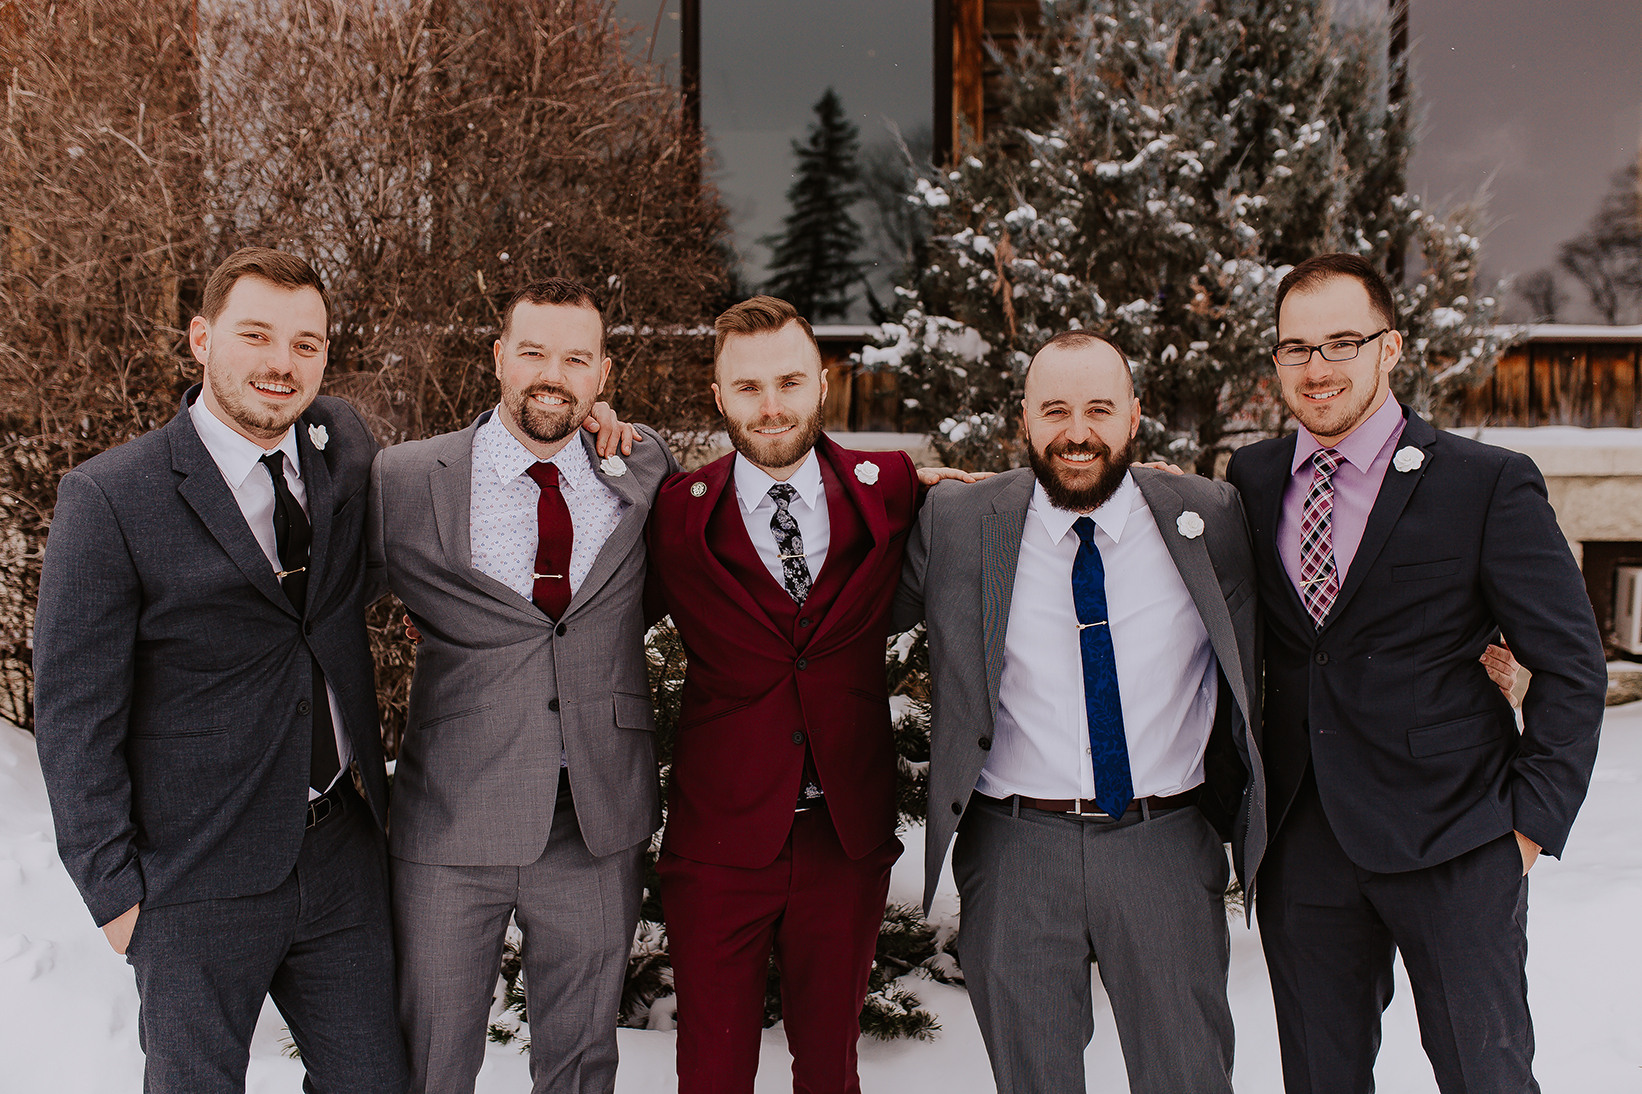 Wedding_Party_Formals_111_web.jpg